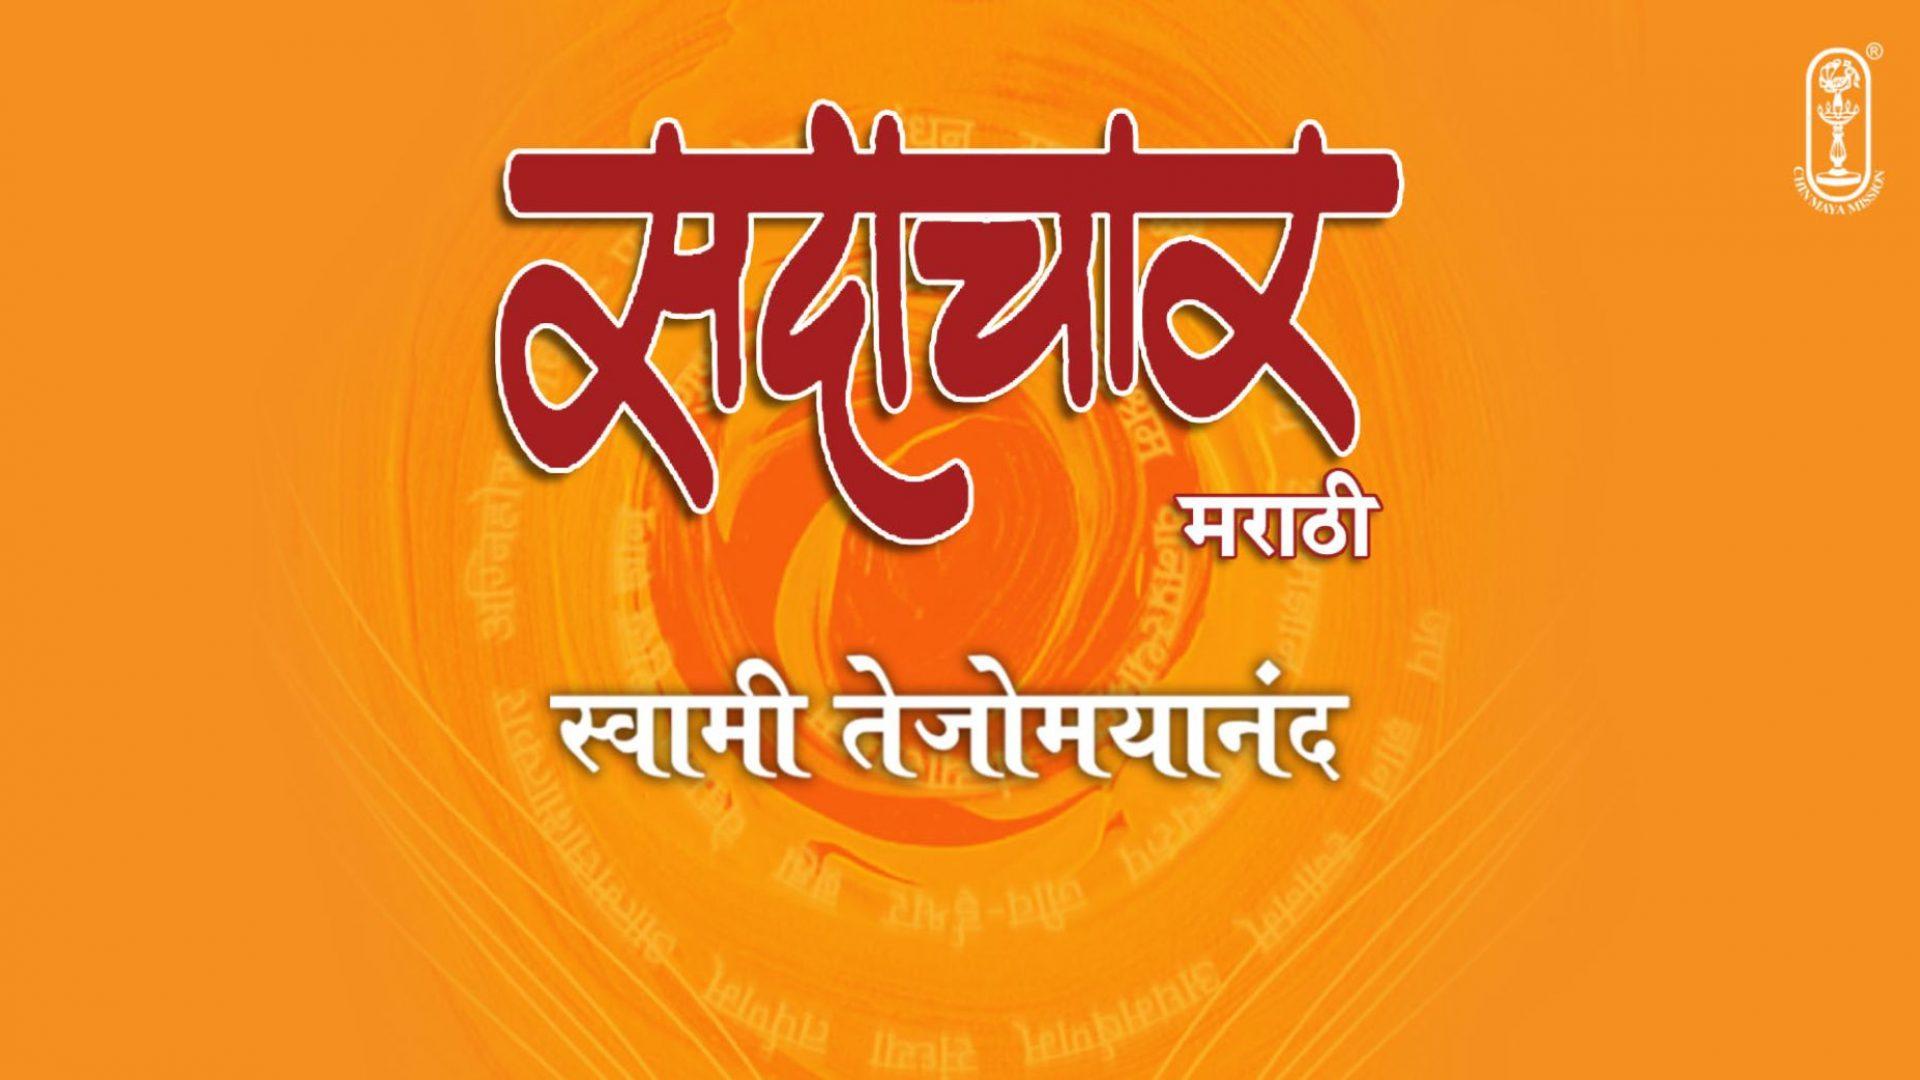 Sadachar Marathin